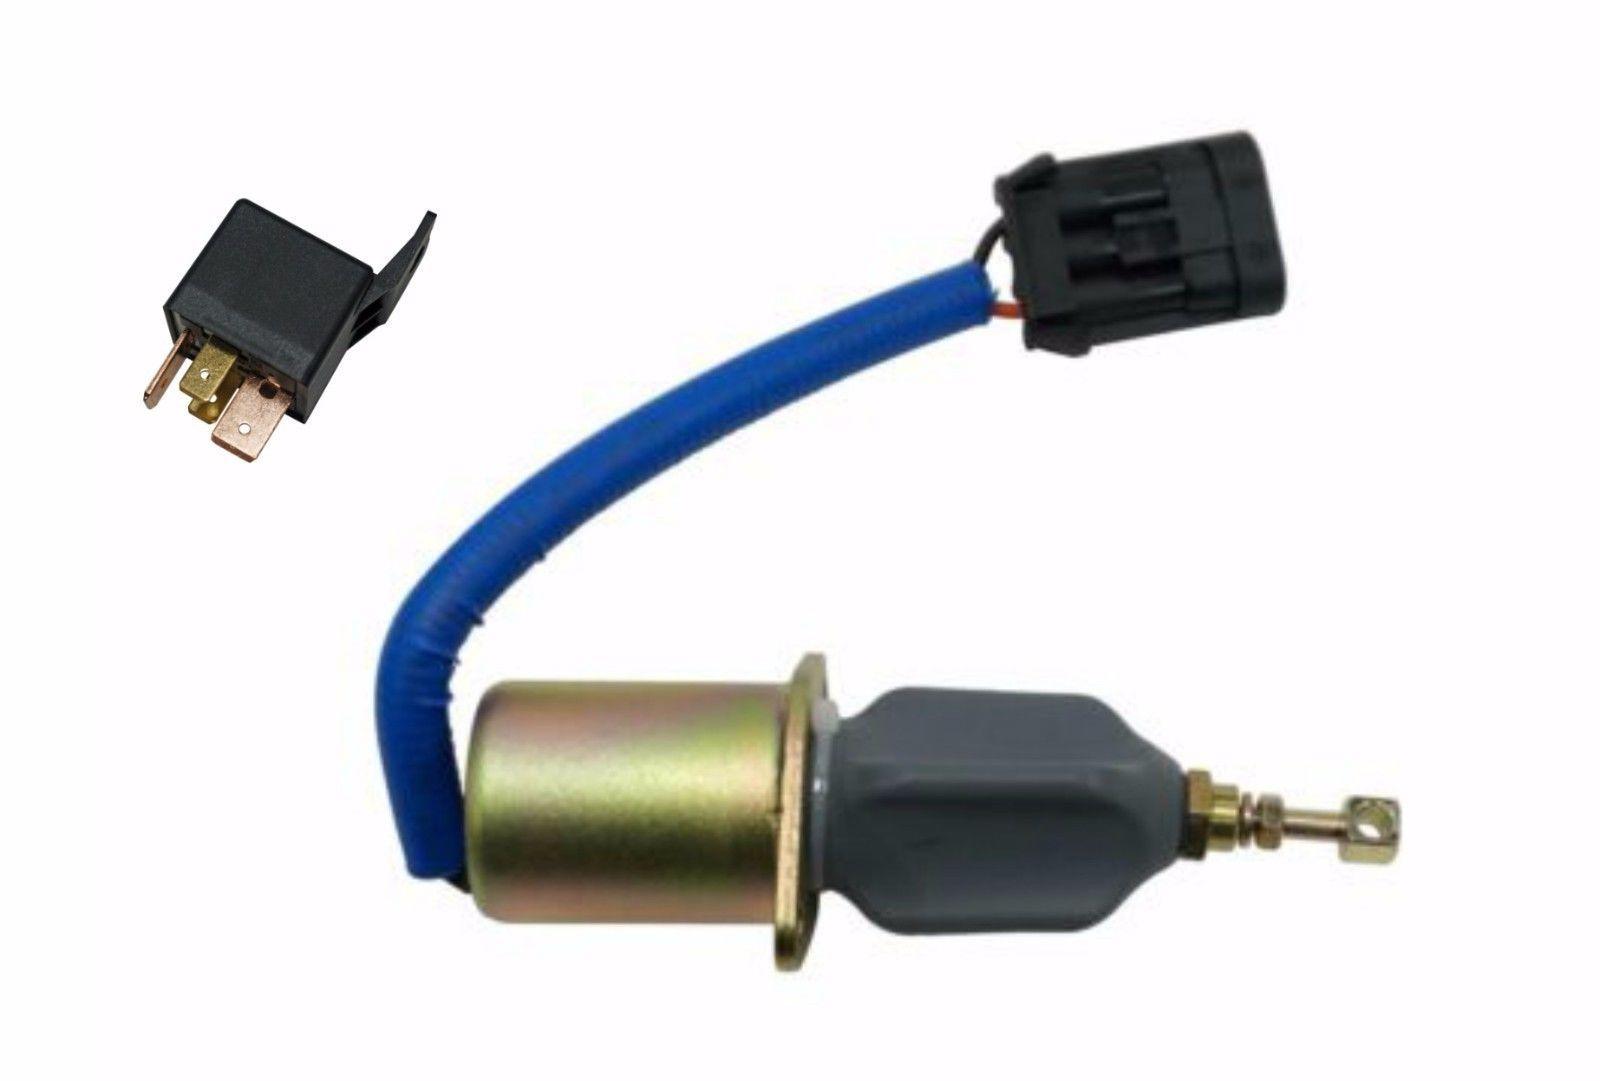 ProSource Diesel Fuel Shut Off Solenoid With Relay For 5.9L 94-98 Cummins 12V